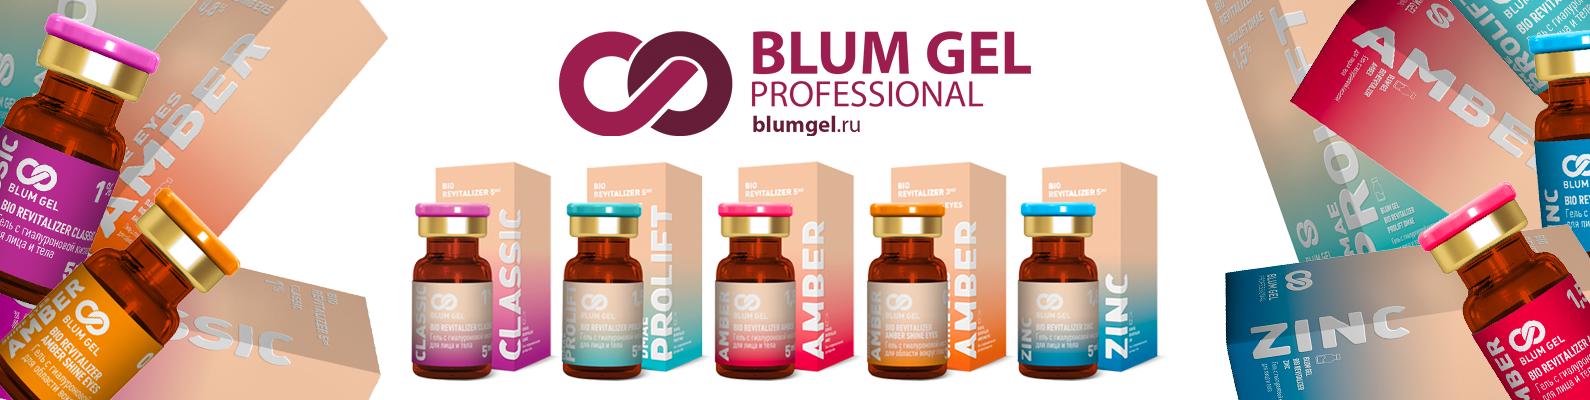 Blum Gel